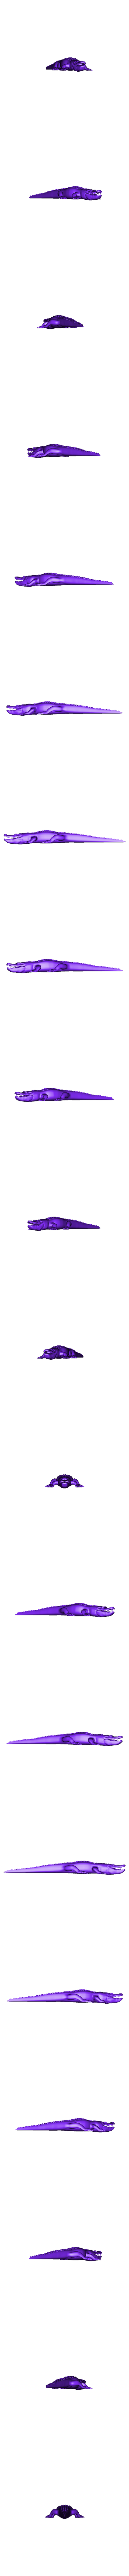 aligator_STL.stl Télécharger fichier OBJ gratuit alligator • Objet à imprimer en 3D, vaibhav210singh